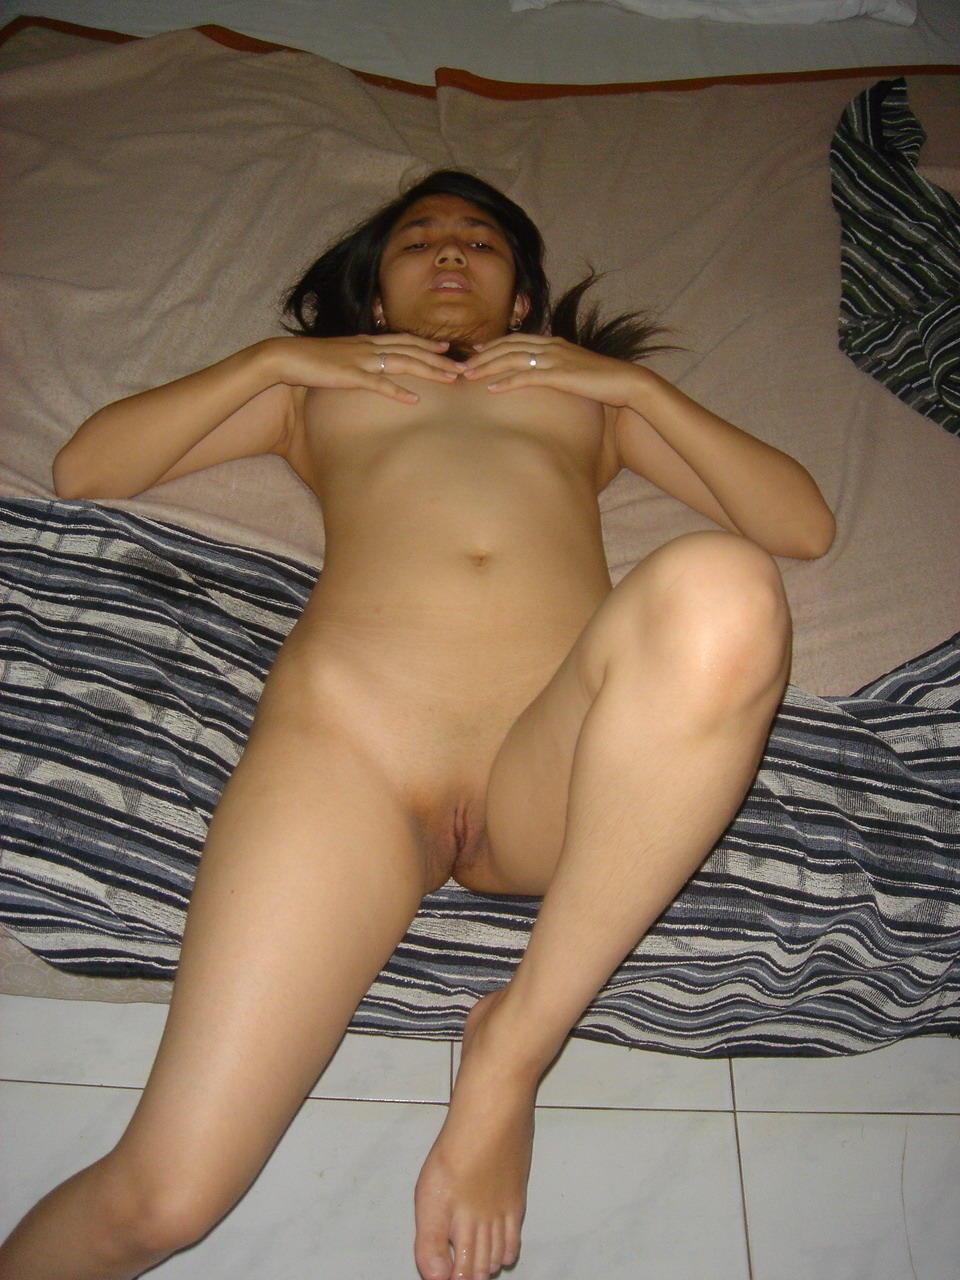 nipples young model thong nude art